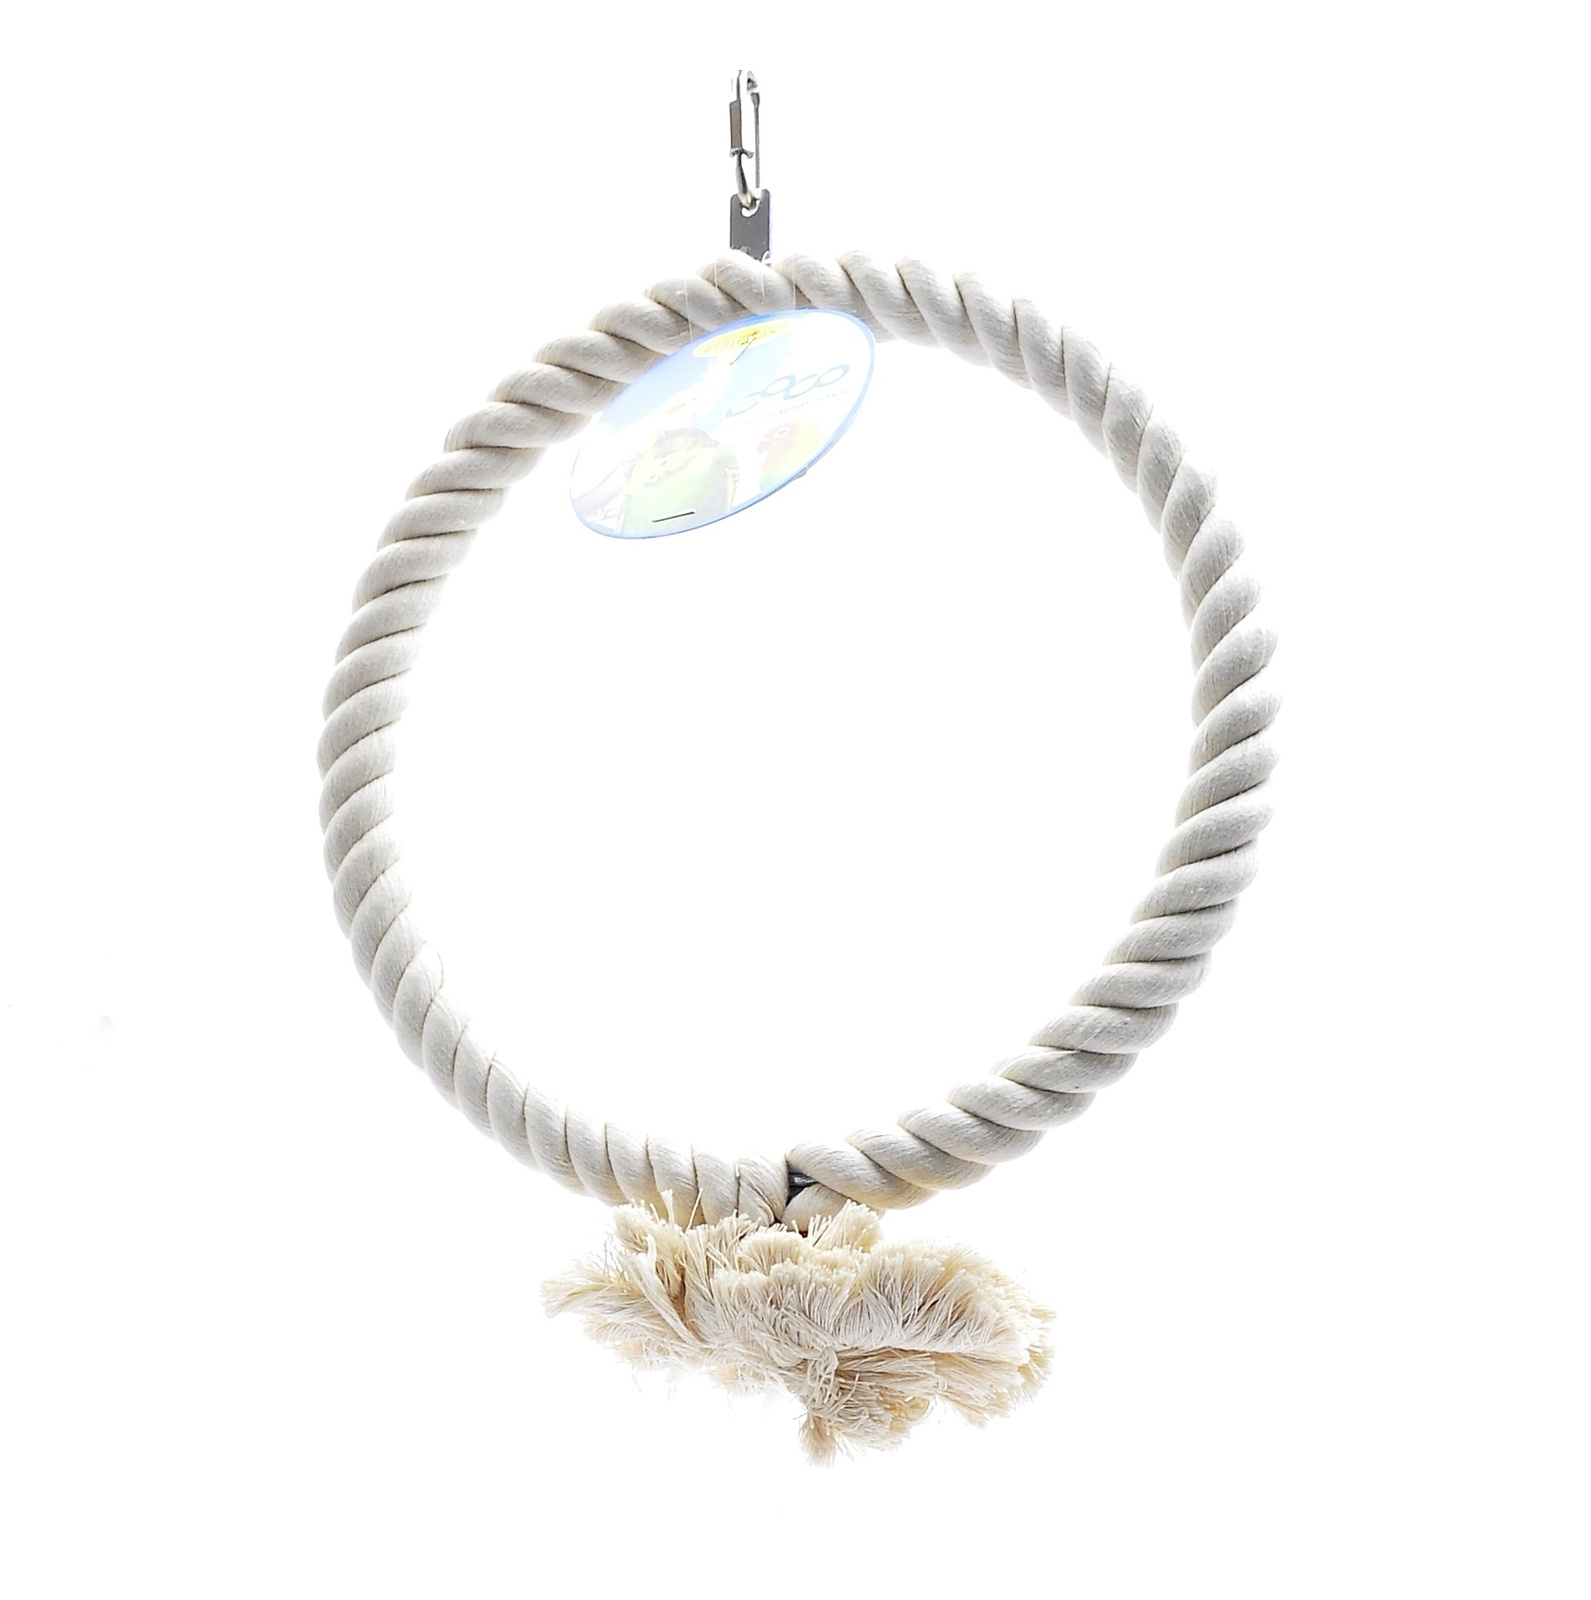 "Benelux Игрушка для попугаев ""Мега Кольцо"" 32 см (Coco super toy 1 ring 32 cm) 14445 от Ravta"